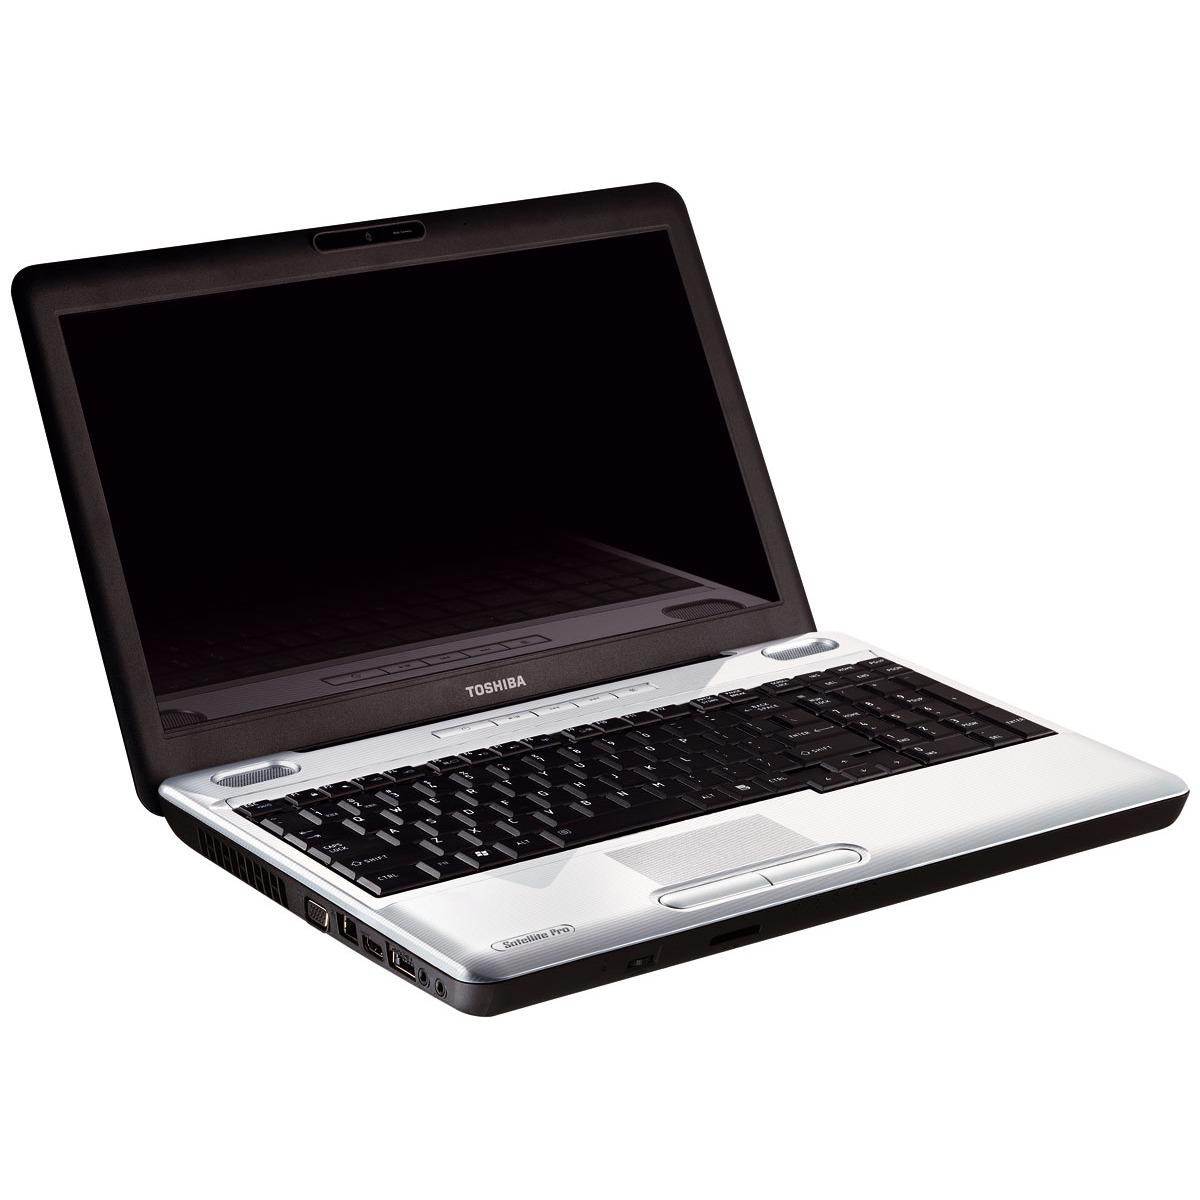 "PC portable Toshiba Satellite Pro L500-1W7 Toshiba Satellite Pro L500-1W7 - Intel Core i5-430M 4 Go 500 Go 15.6"" LED Graveur DVD Wi-Fi N/Bluetooth Webcam Windows 7 Professionnel 32 bits + XP Pro"